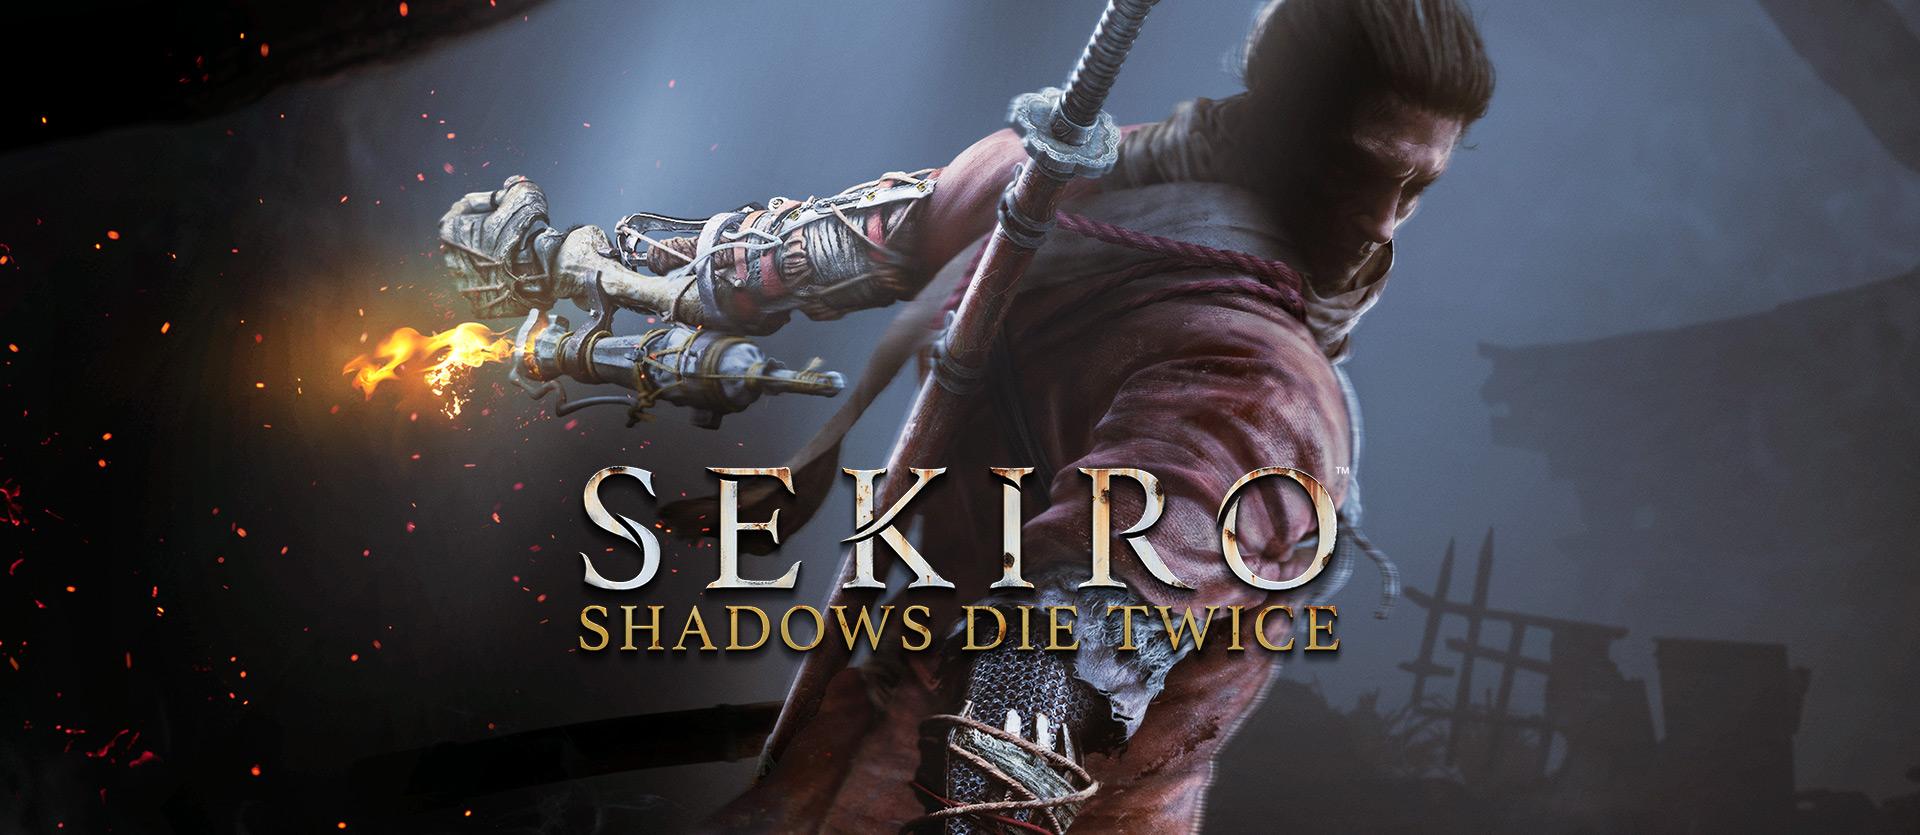 Sekiro Shadows Die Twice hardwarové požadavky